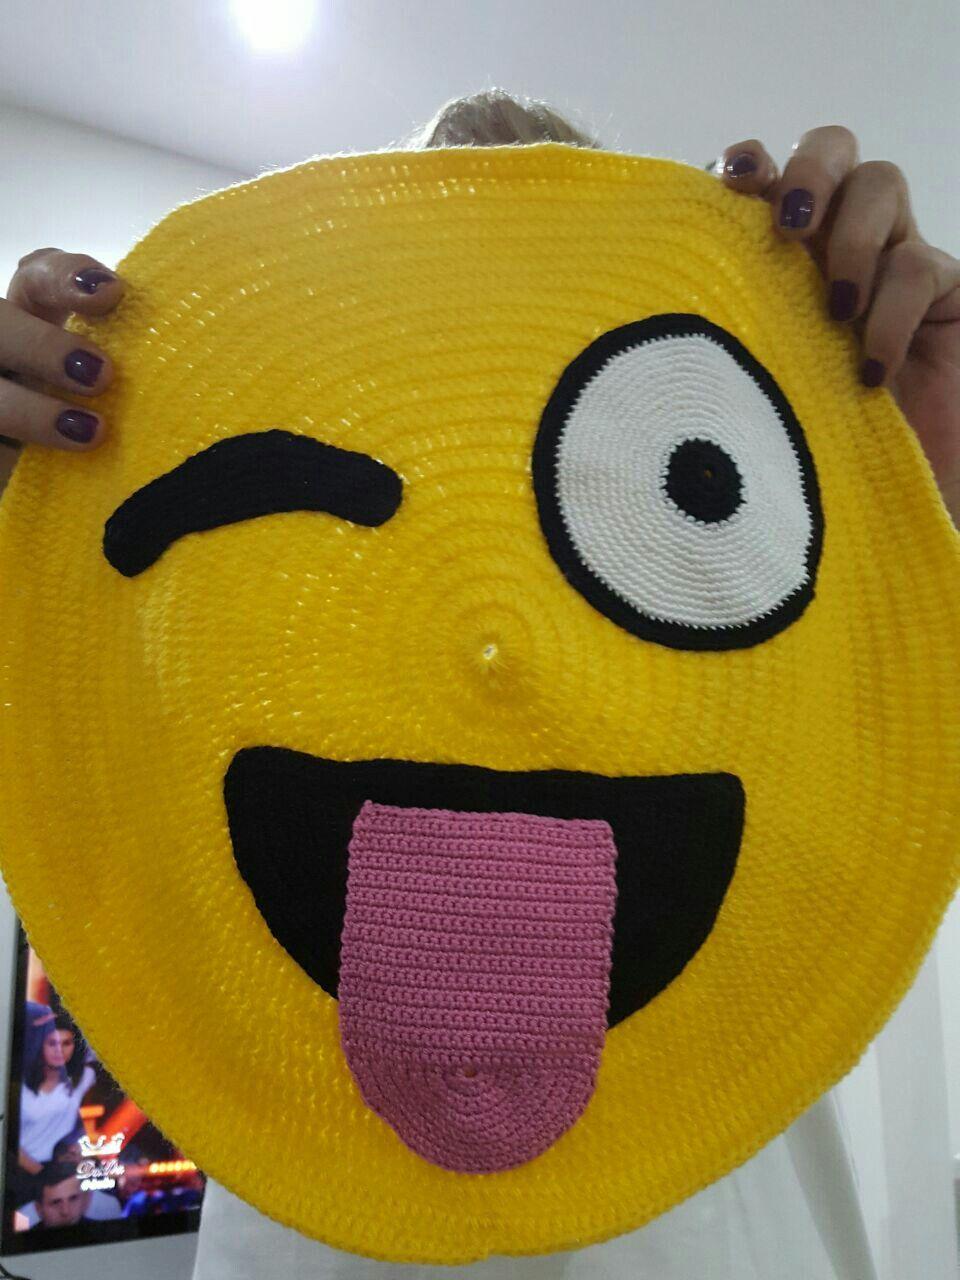 71b04e47d81b4b Emoji crochet | Crochet projects | Almofadas de croche, Tapete de ...